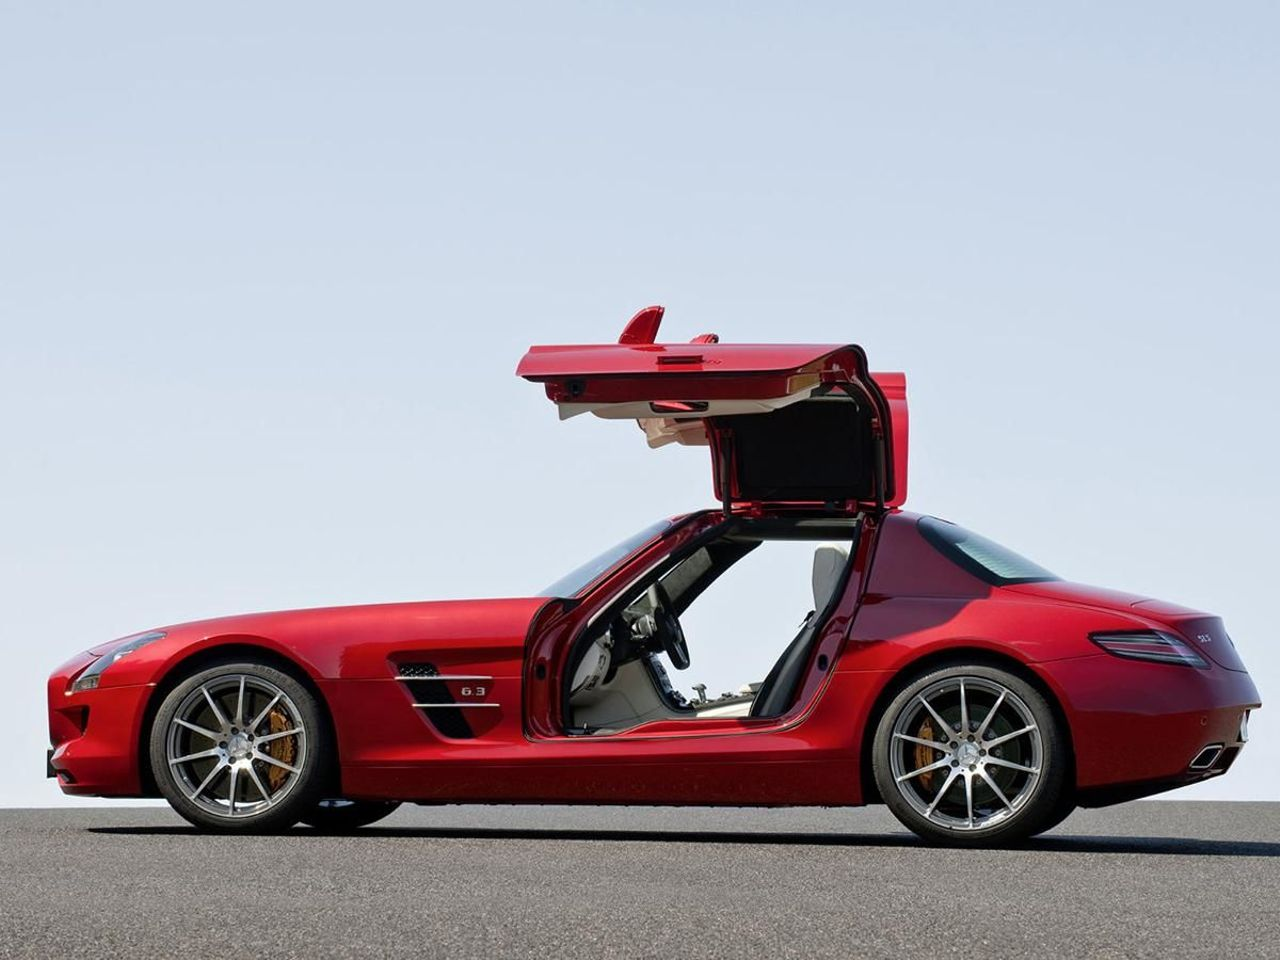 Mercedes SLS AMG coupe